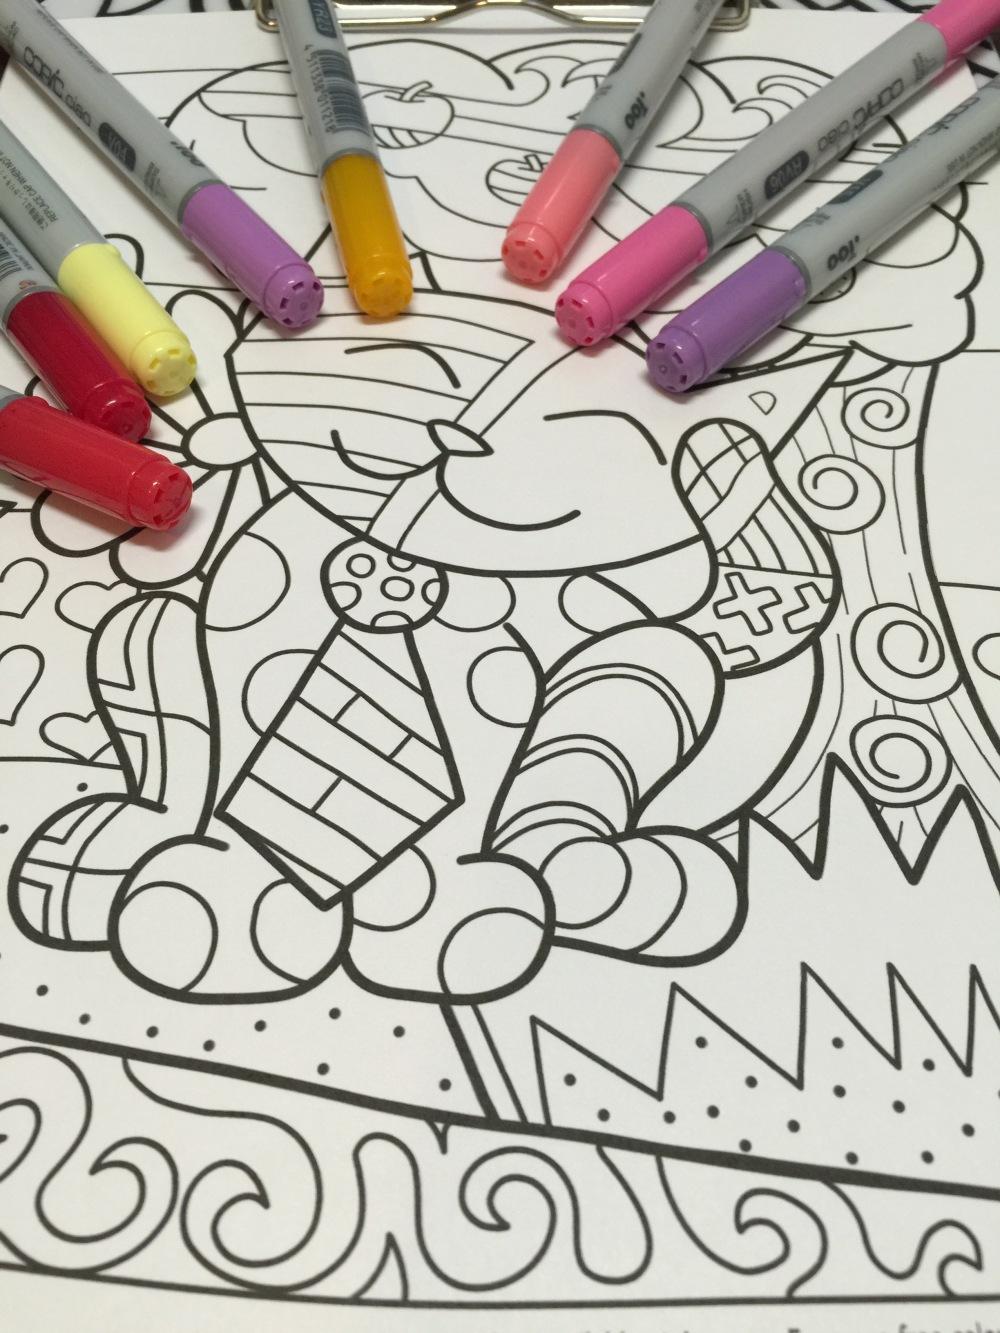 #cherylcolors wip Thiago Utra